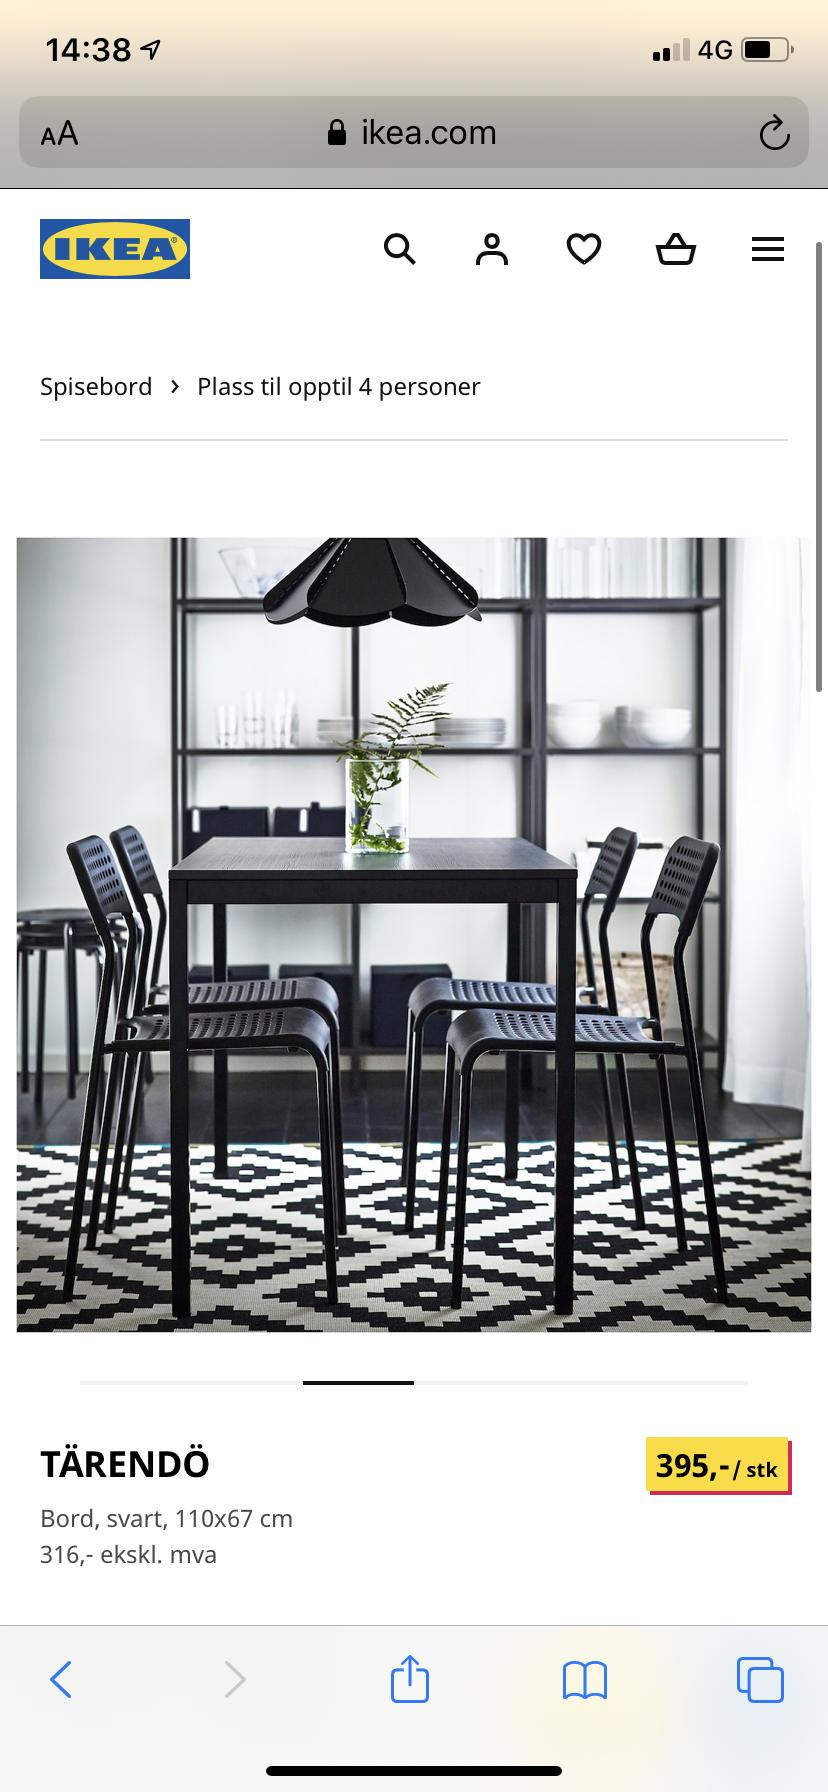 Picture of: Ikea Spisebord 3 Stoler Finn No